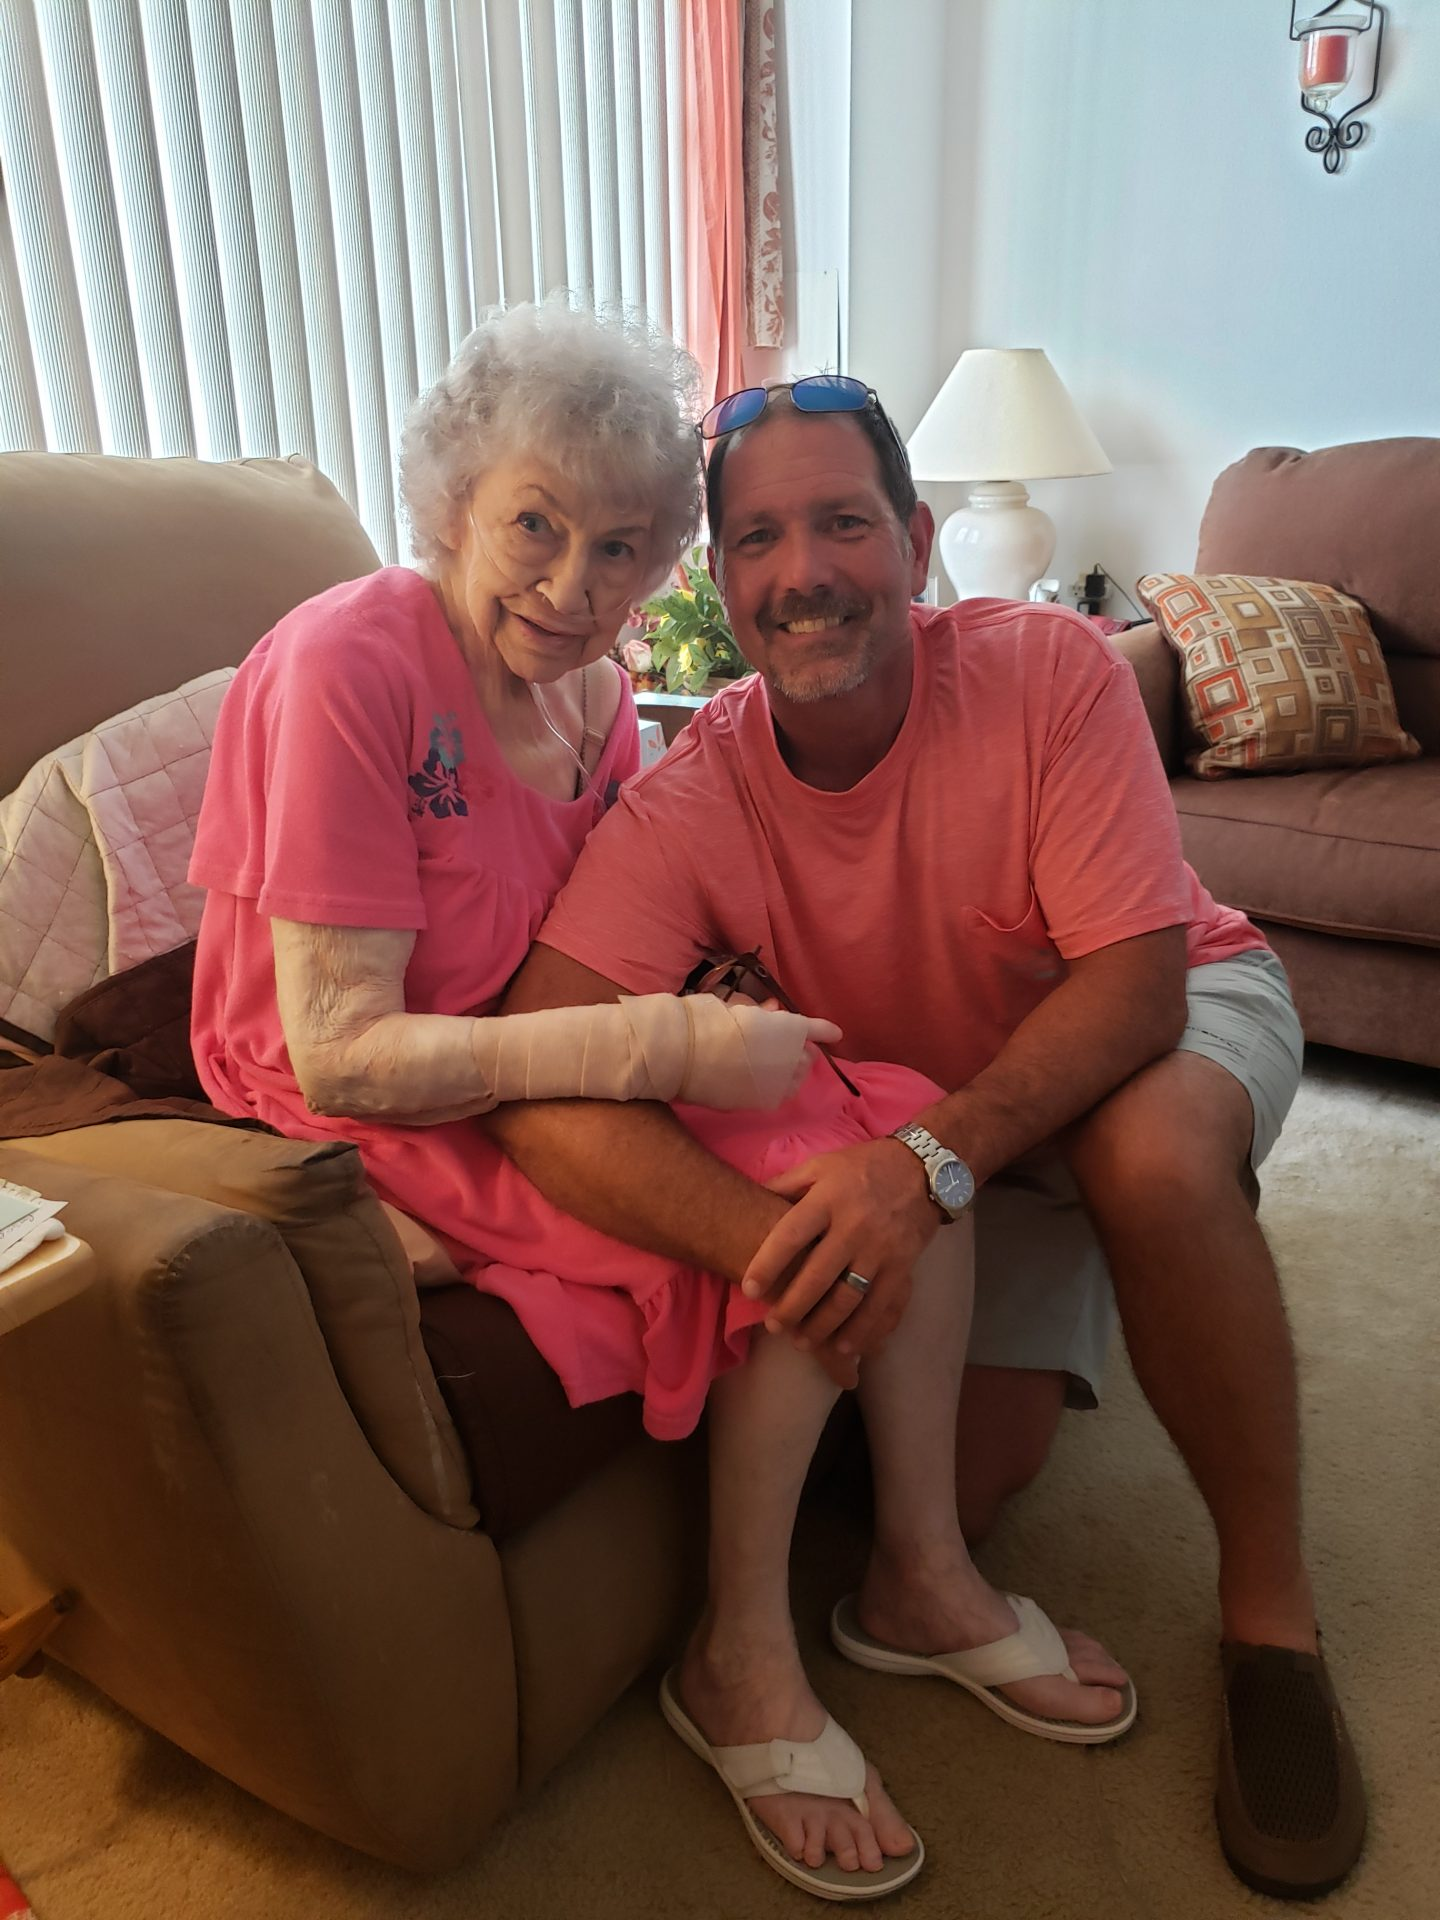 Grandma and Me, Summer 2019